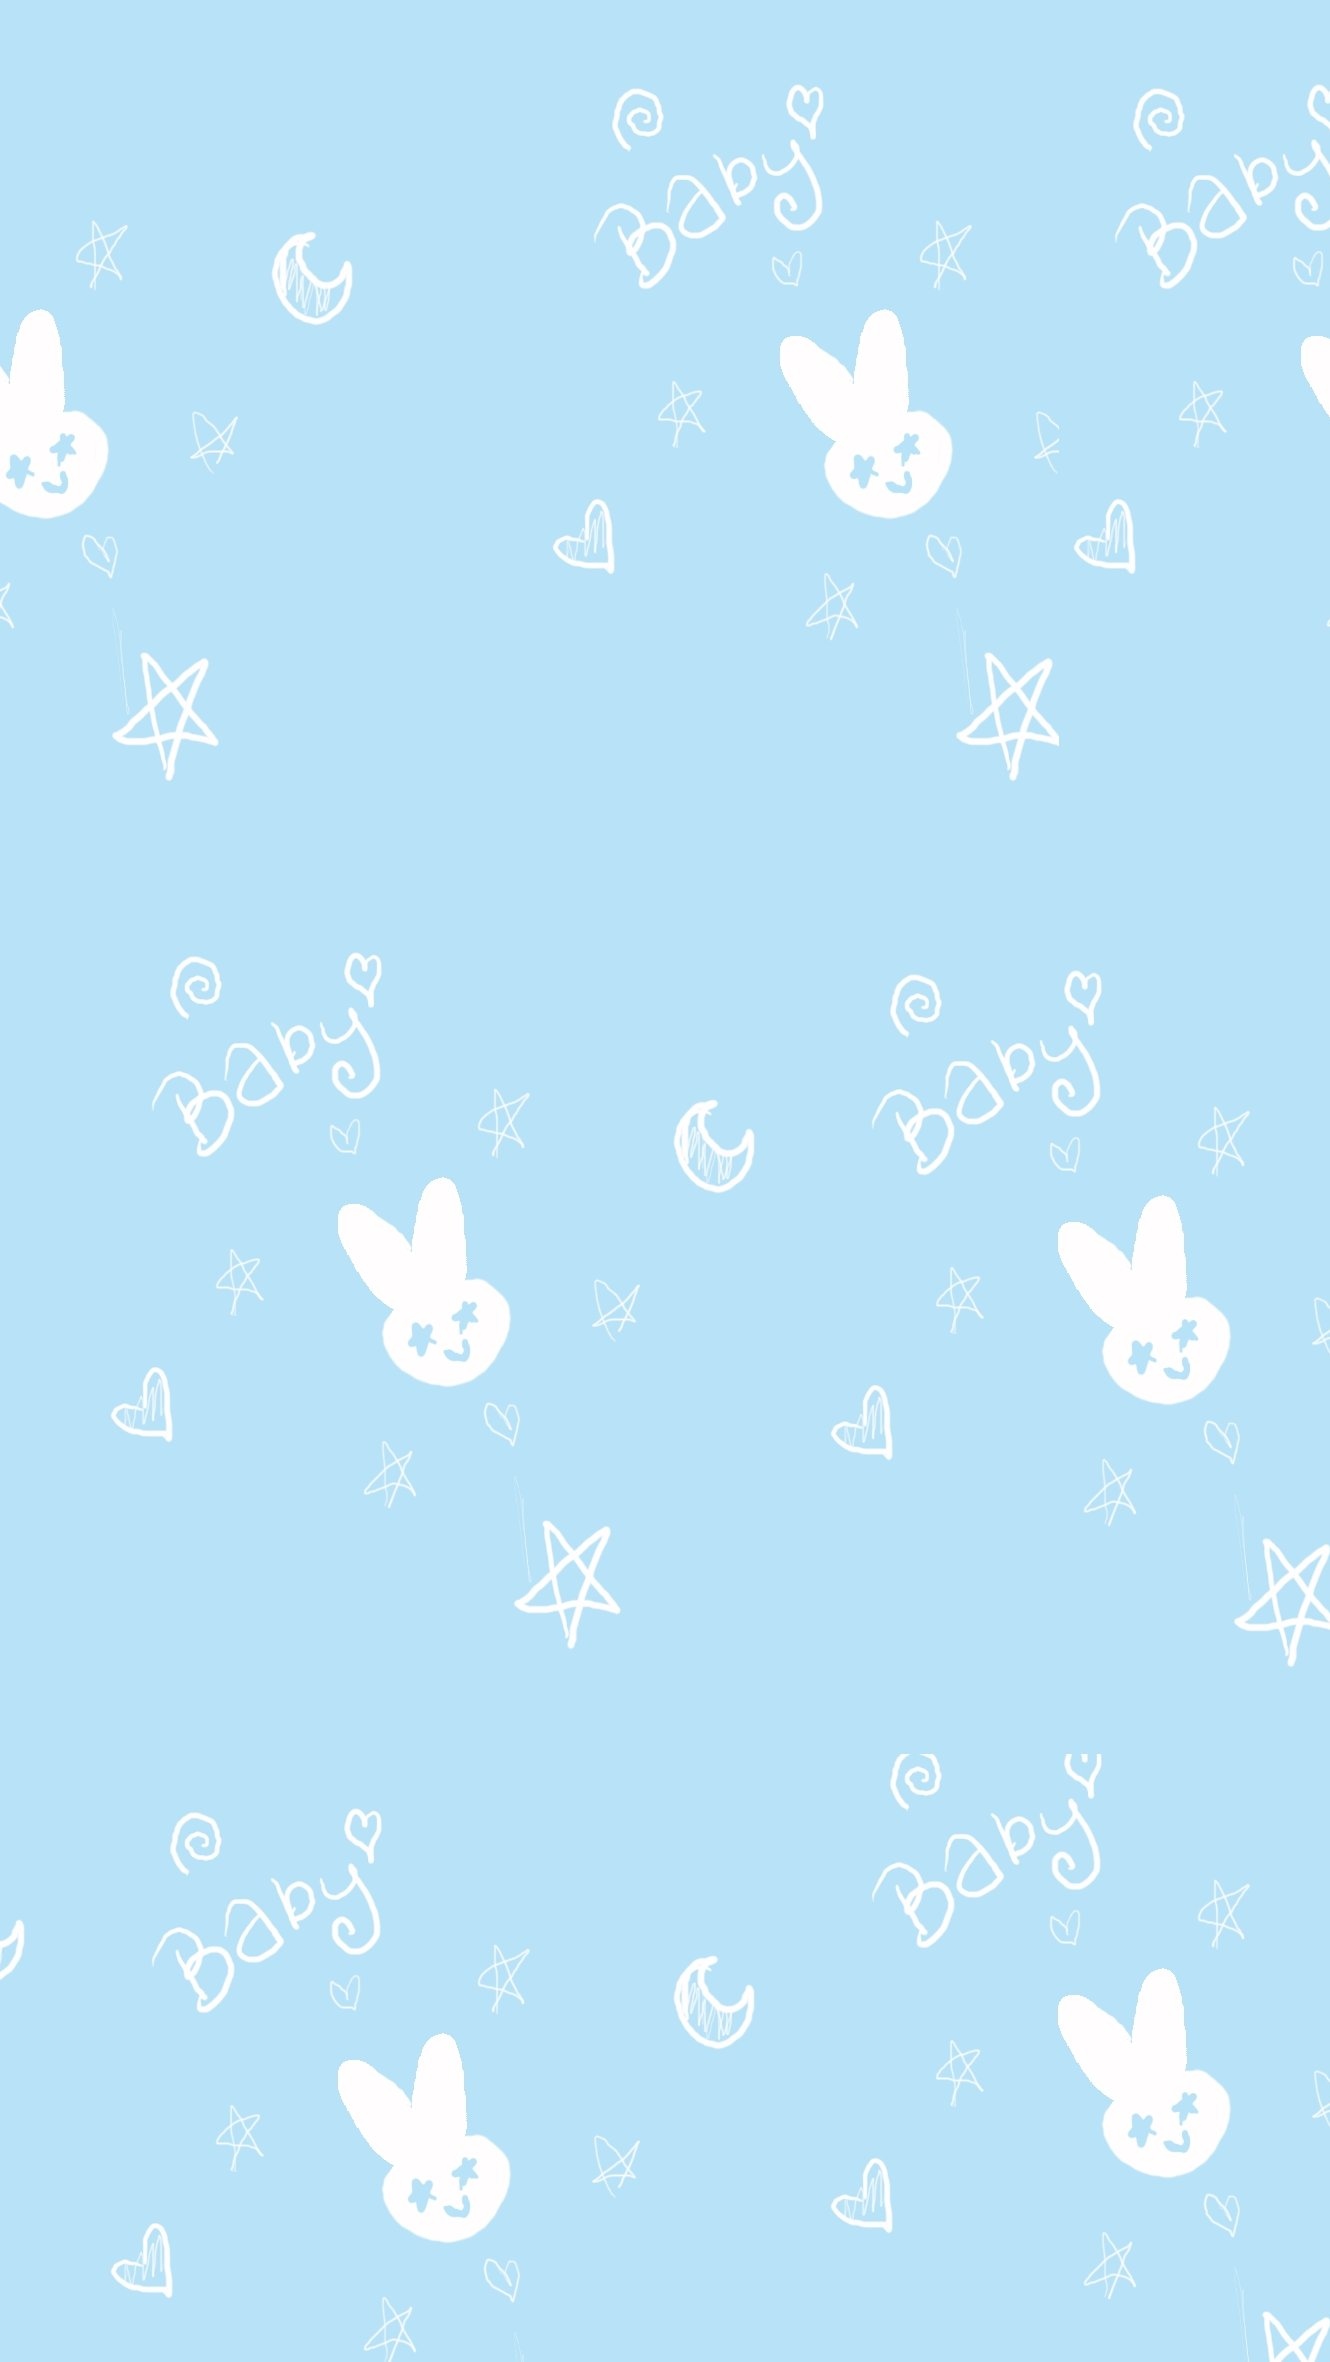 Fondos de pantalla Patrón de conejo arte Vertical